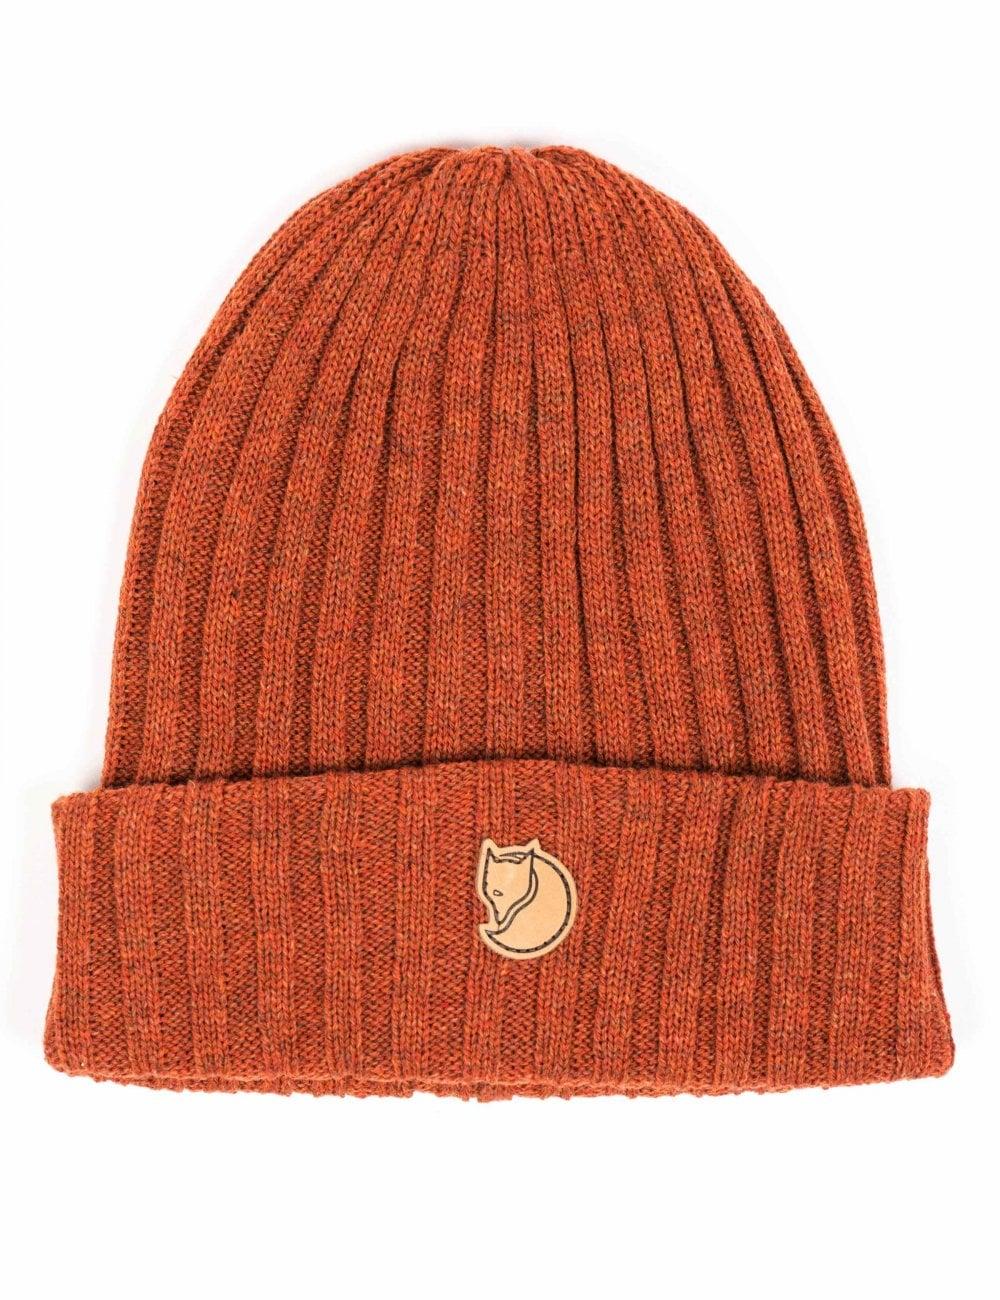 c6edbe5902a72f Fjallraven Byron Beanie Hat - Autumn Leaf - Accessories from Fat ...